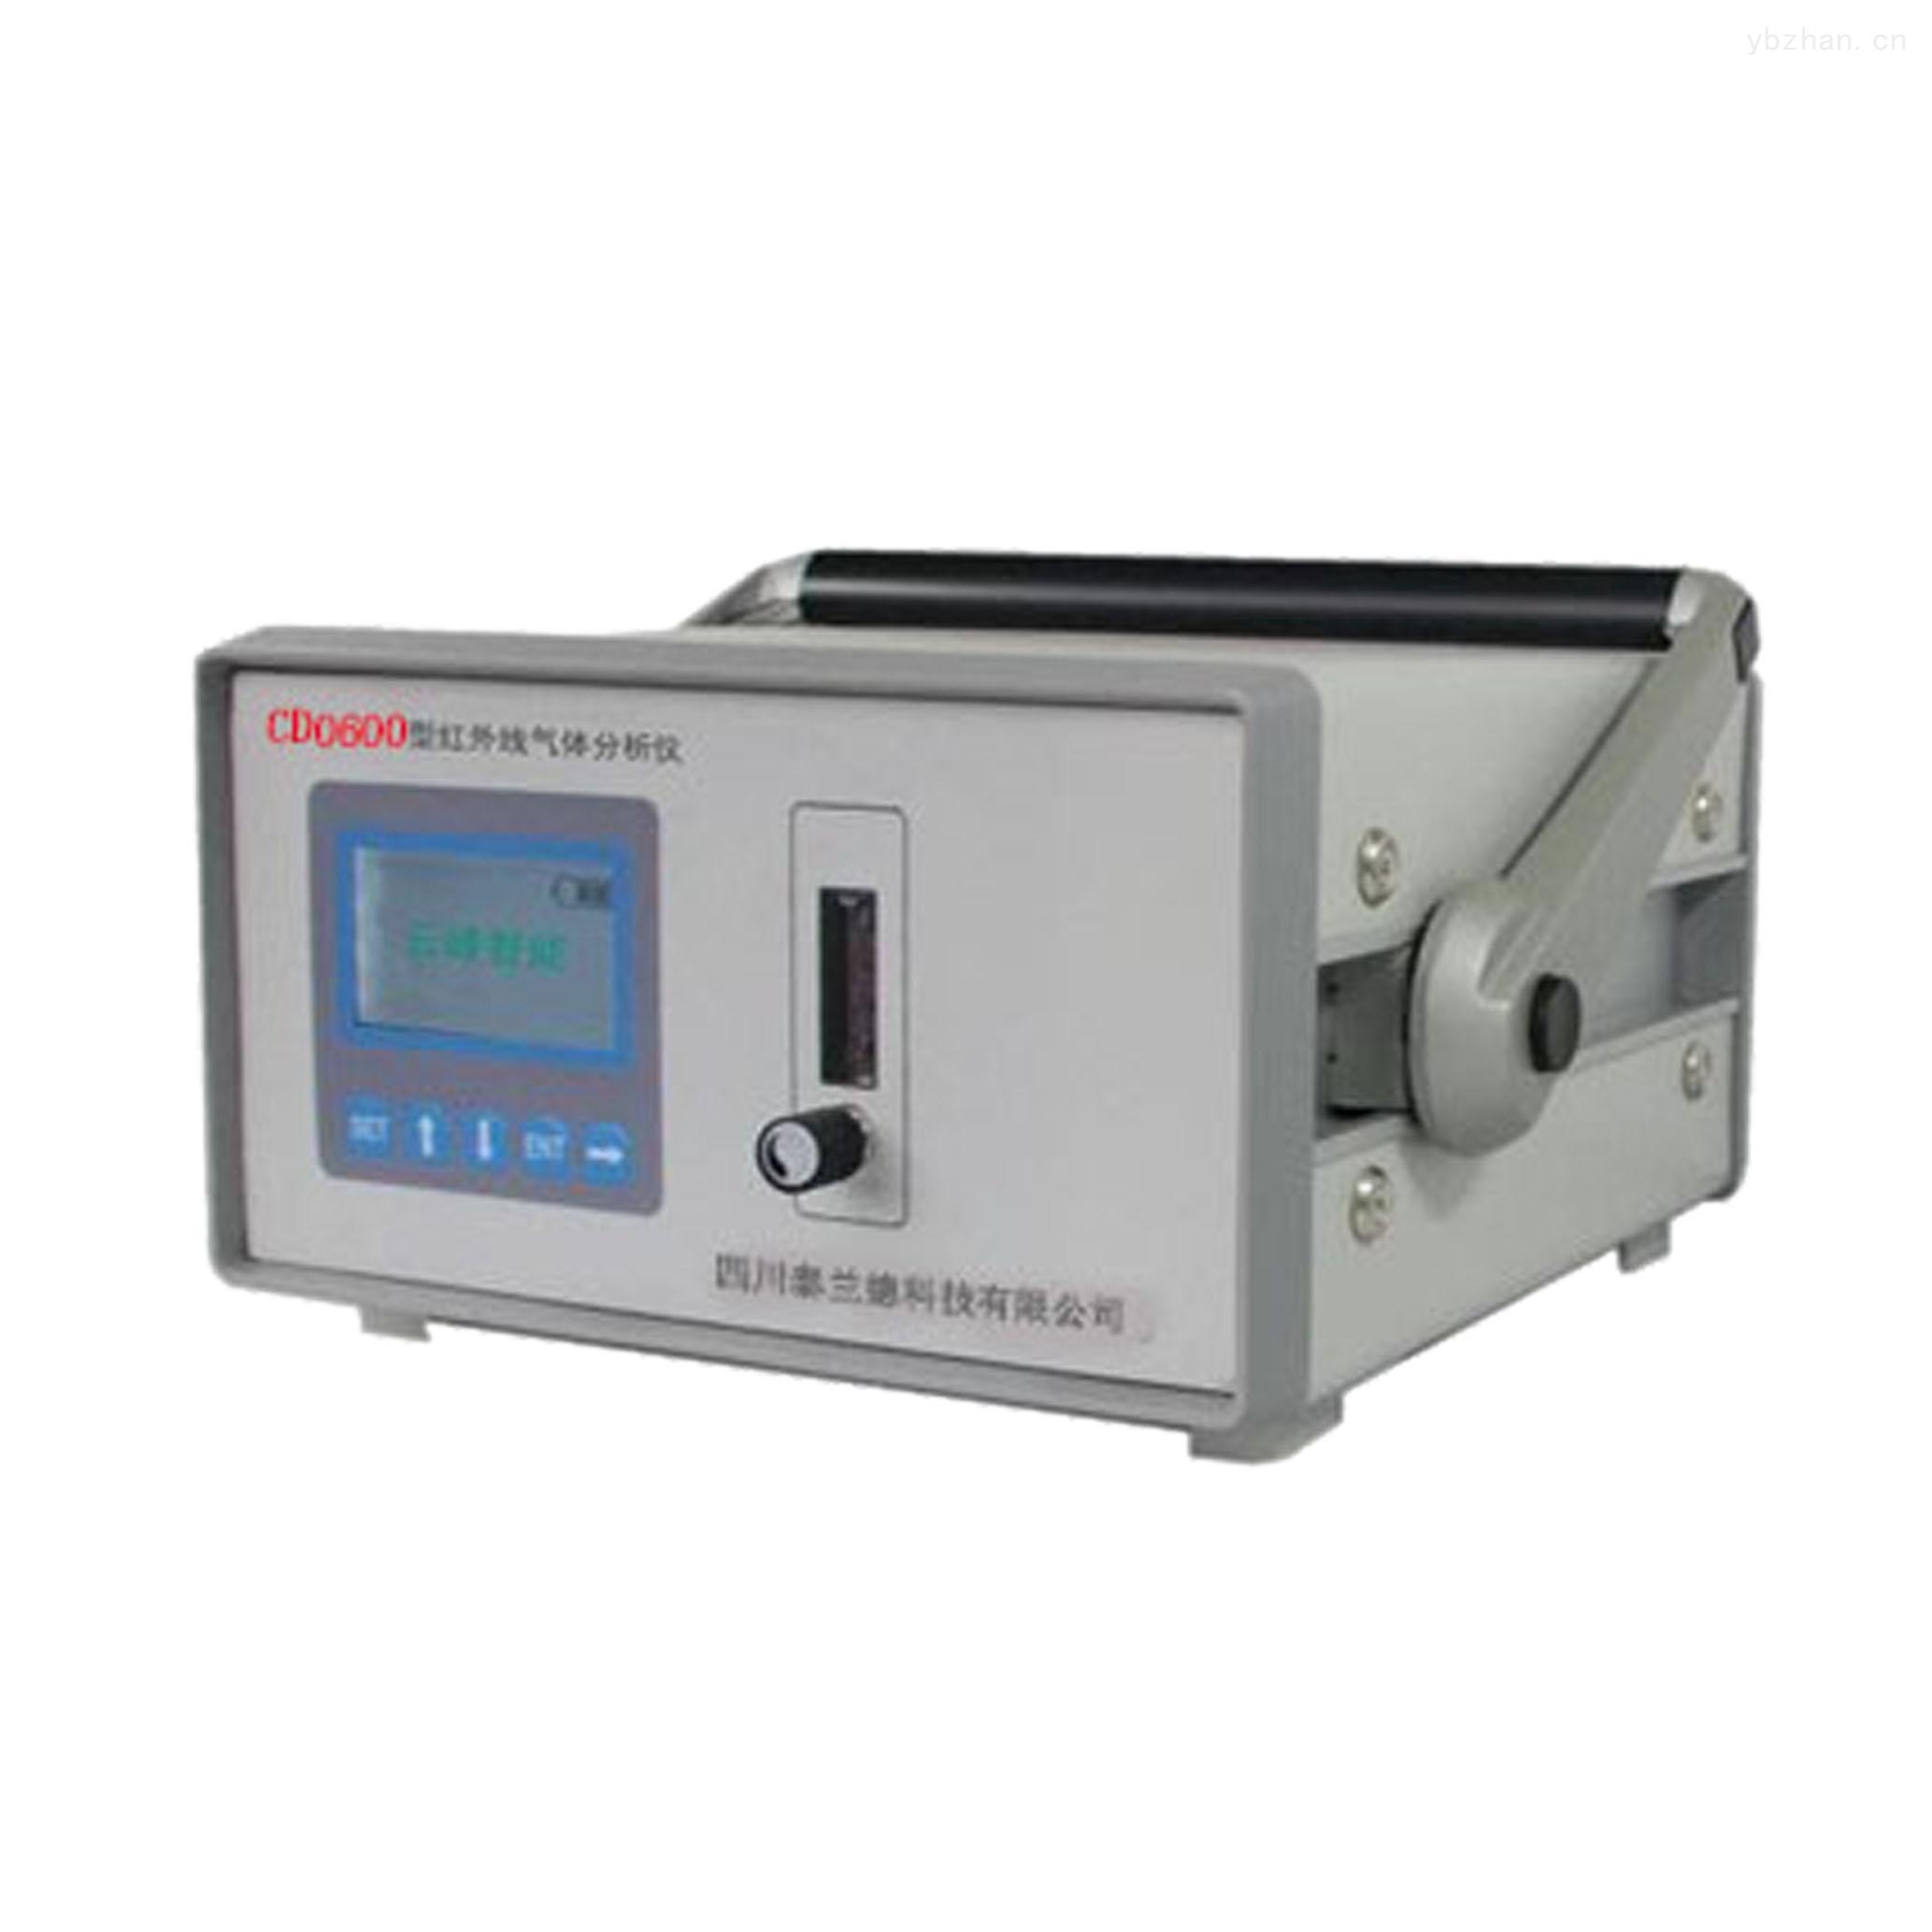 CDO600型紅外線氣體分析儀廠商